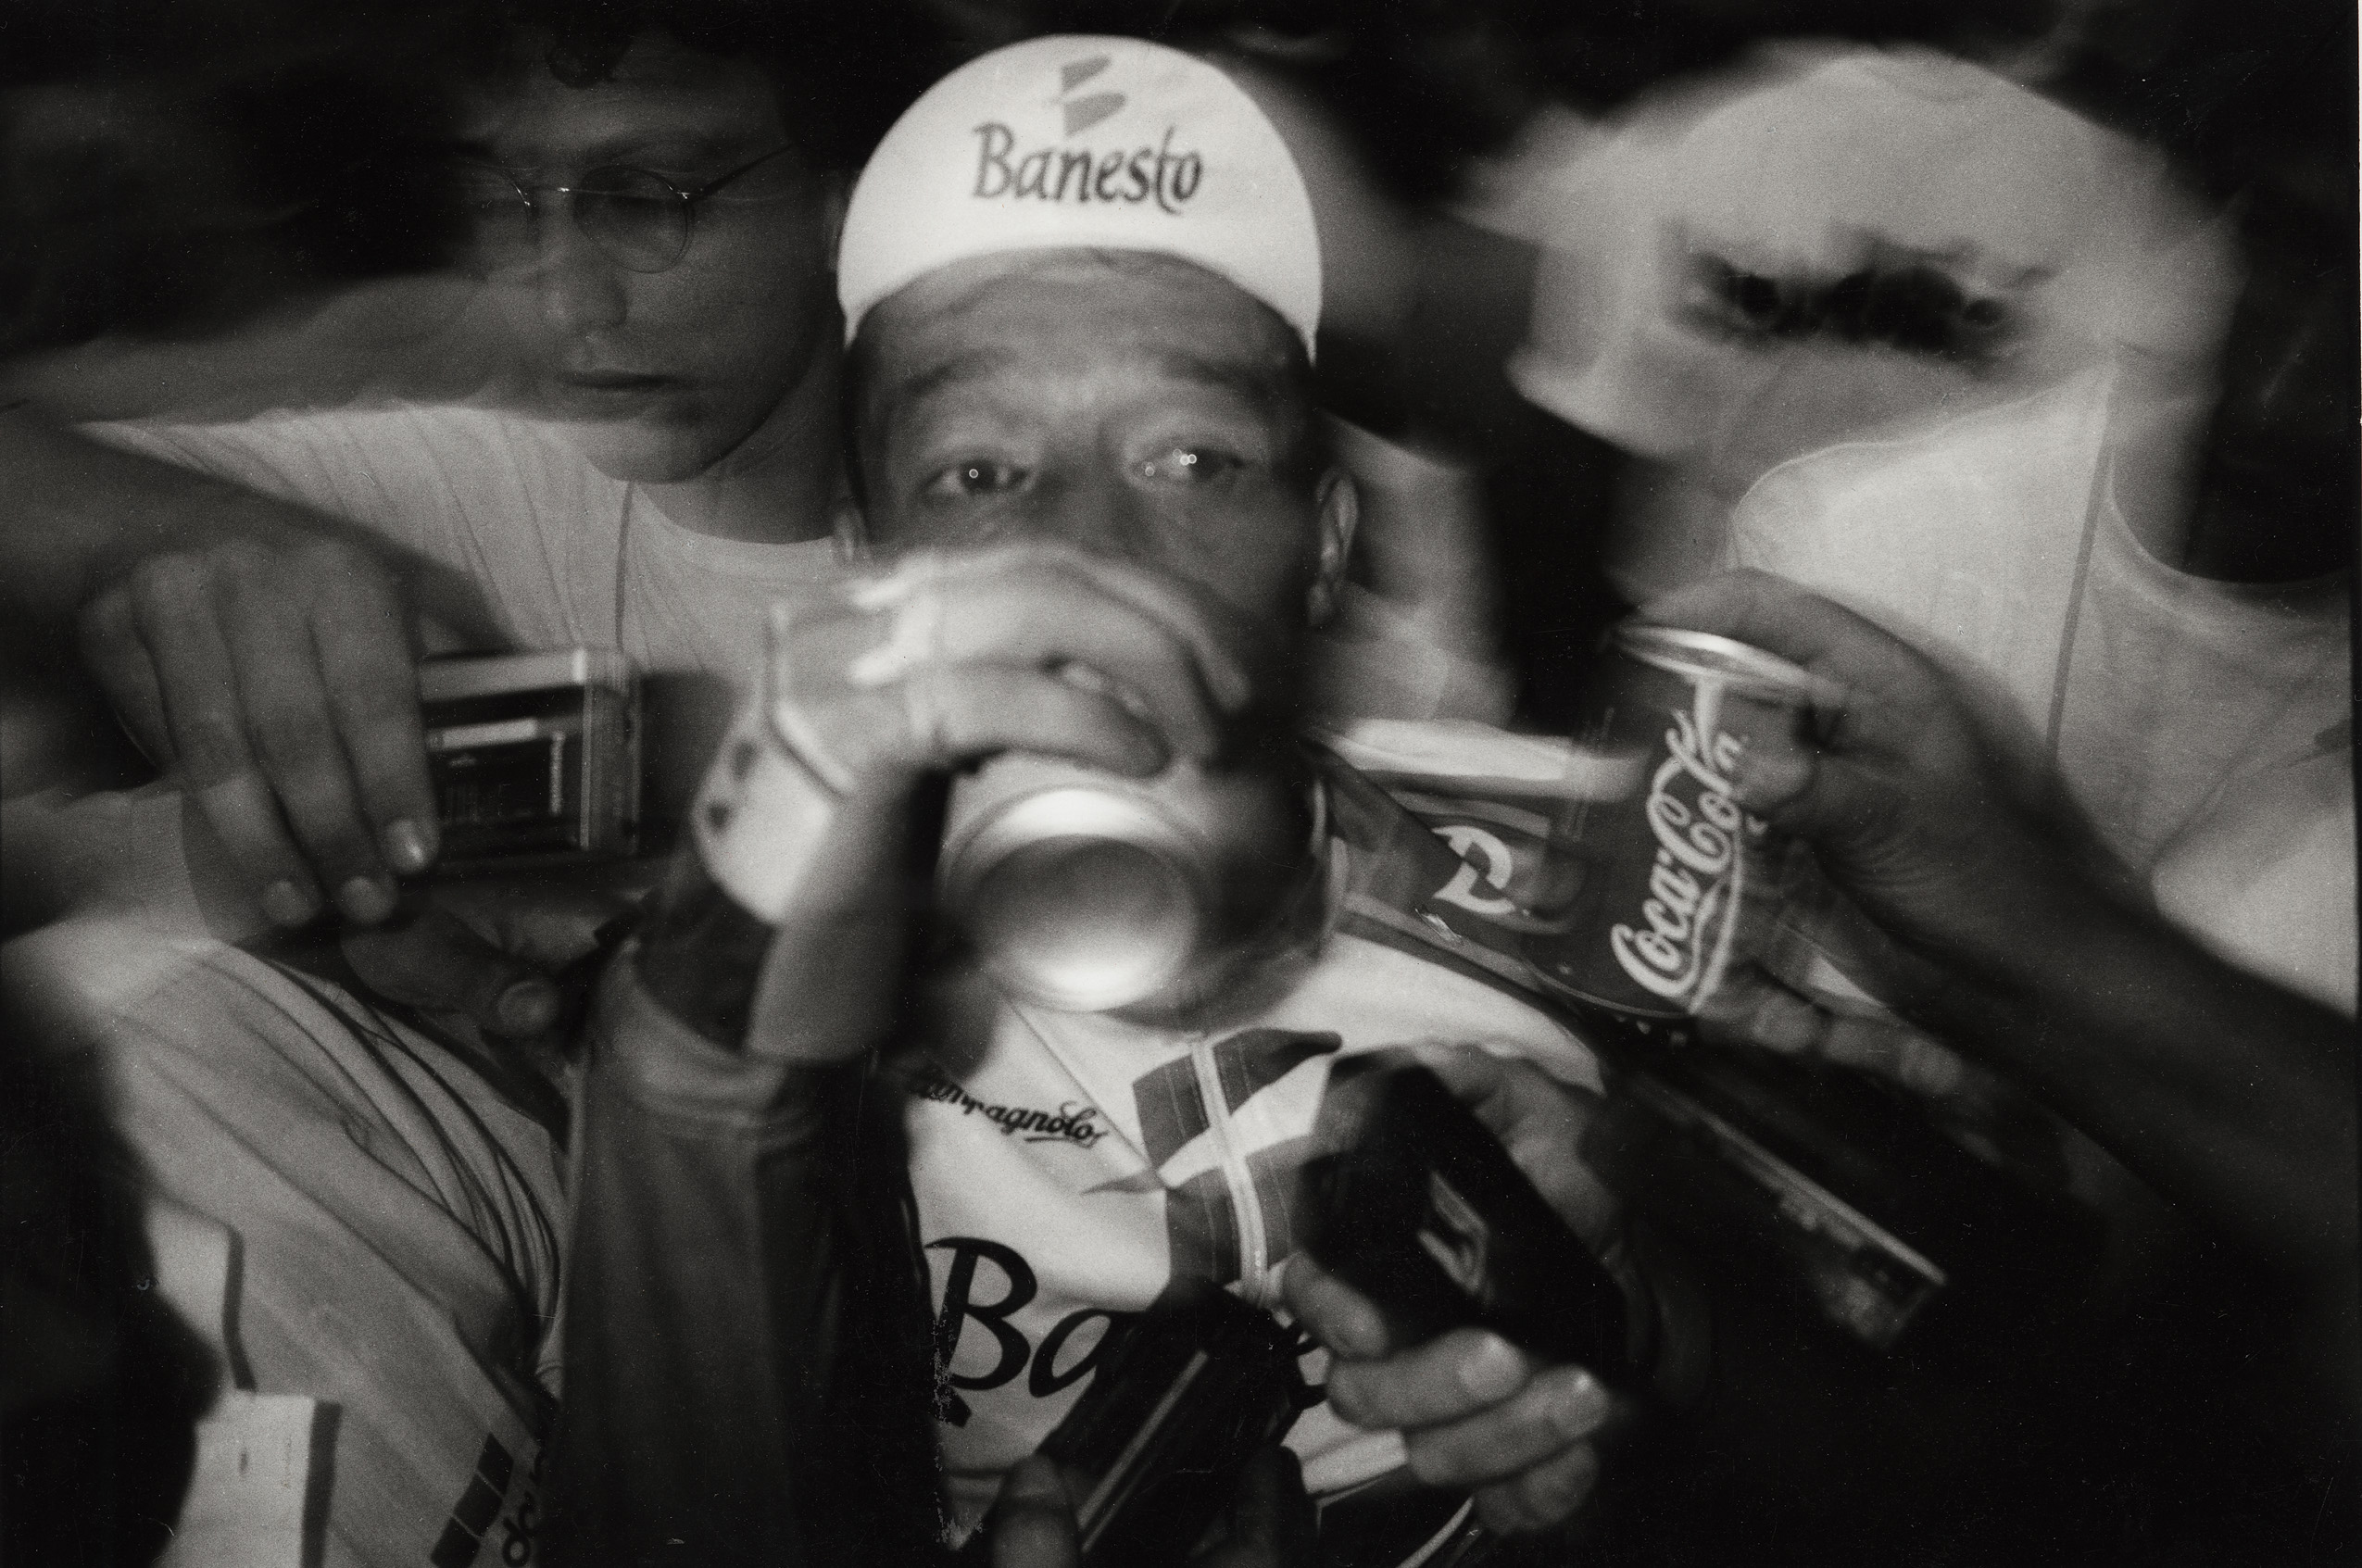 Jean-Francois Bernard, 1992